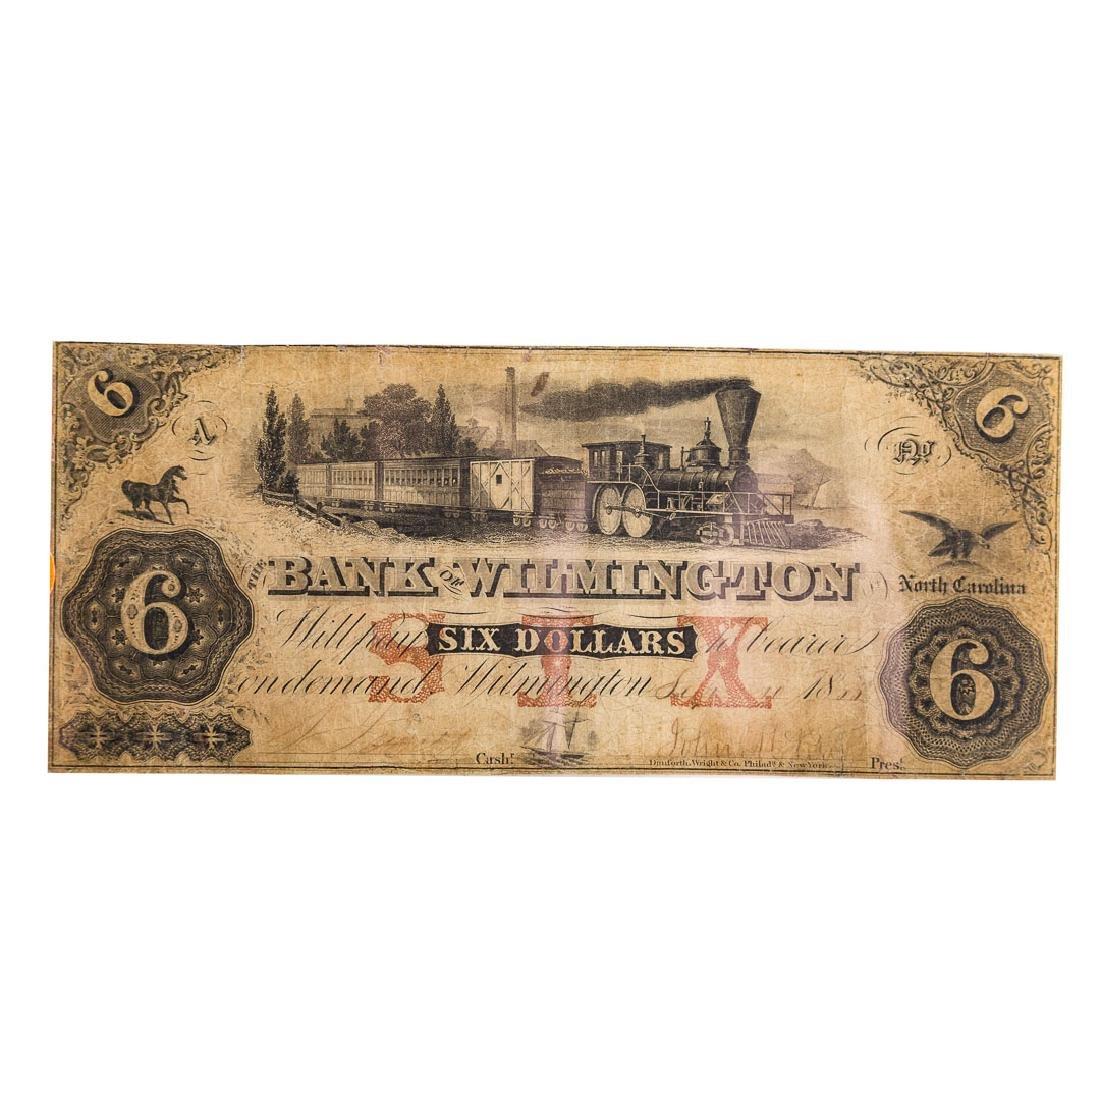 [US] $6 Bank of Wilmington,NC Sept 10 1855 Fine